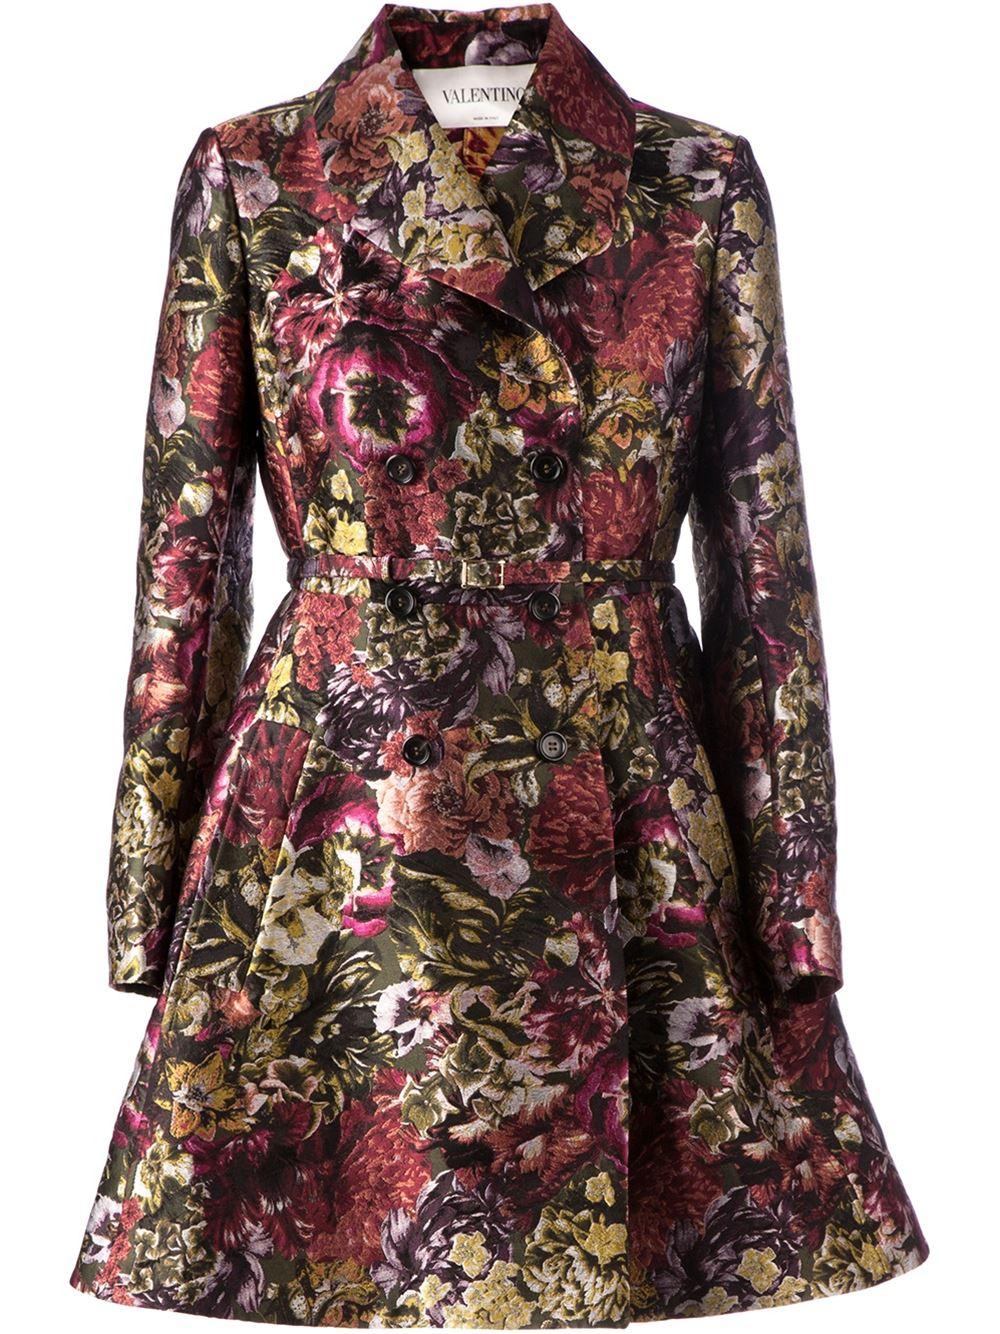 Lyst Valentino Floral Brocade Coat